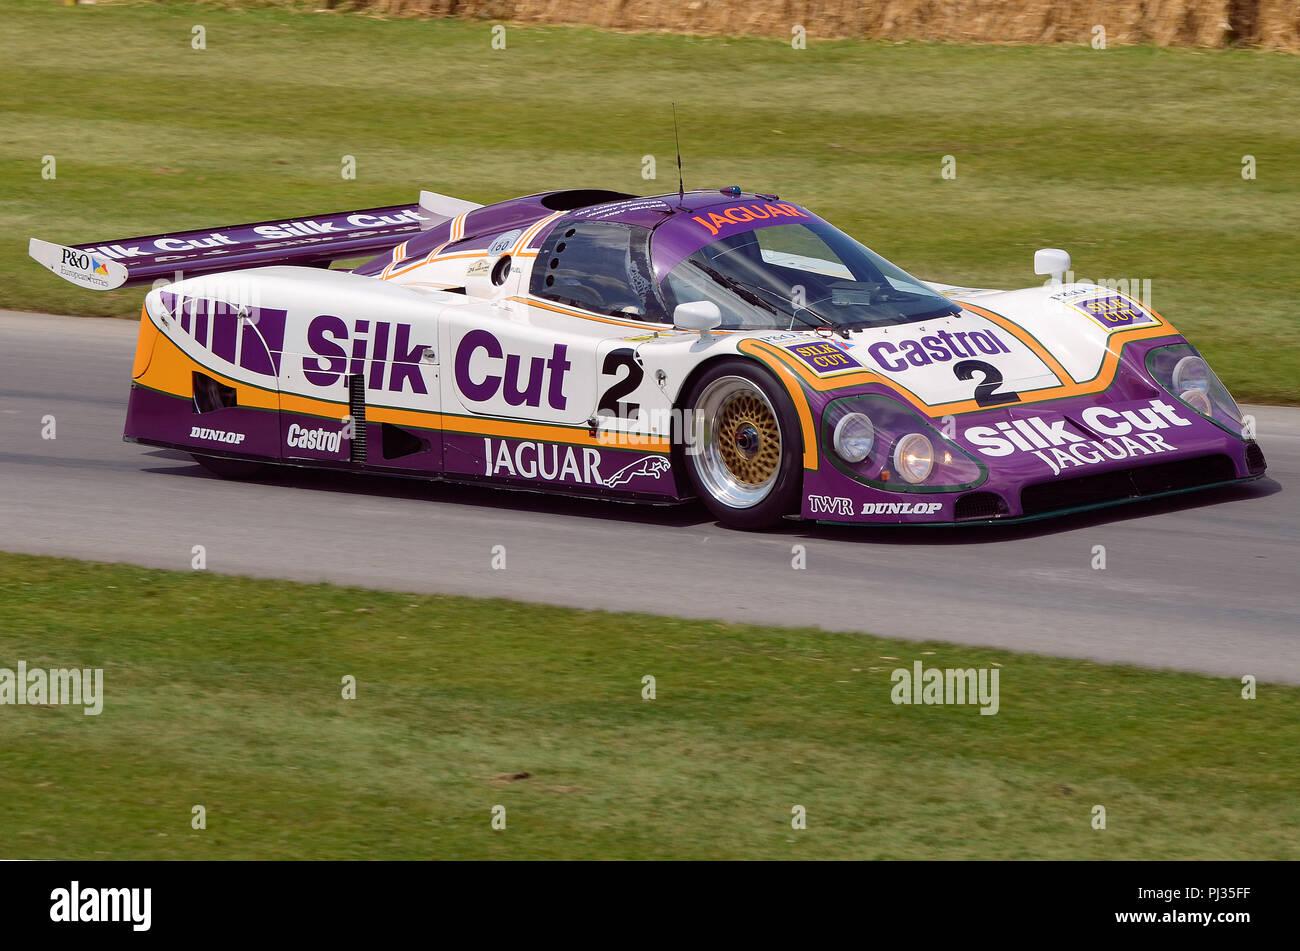 Le Mans Silk Cut Jaguar XJR-9 LM at Goodwood Festival Of Speed. Sports prototype racing car won 1988 FIA World Sports Prototype Championship - Stock Image